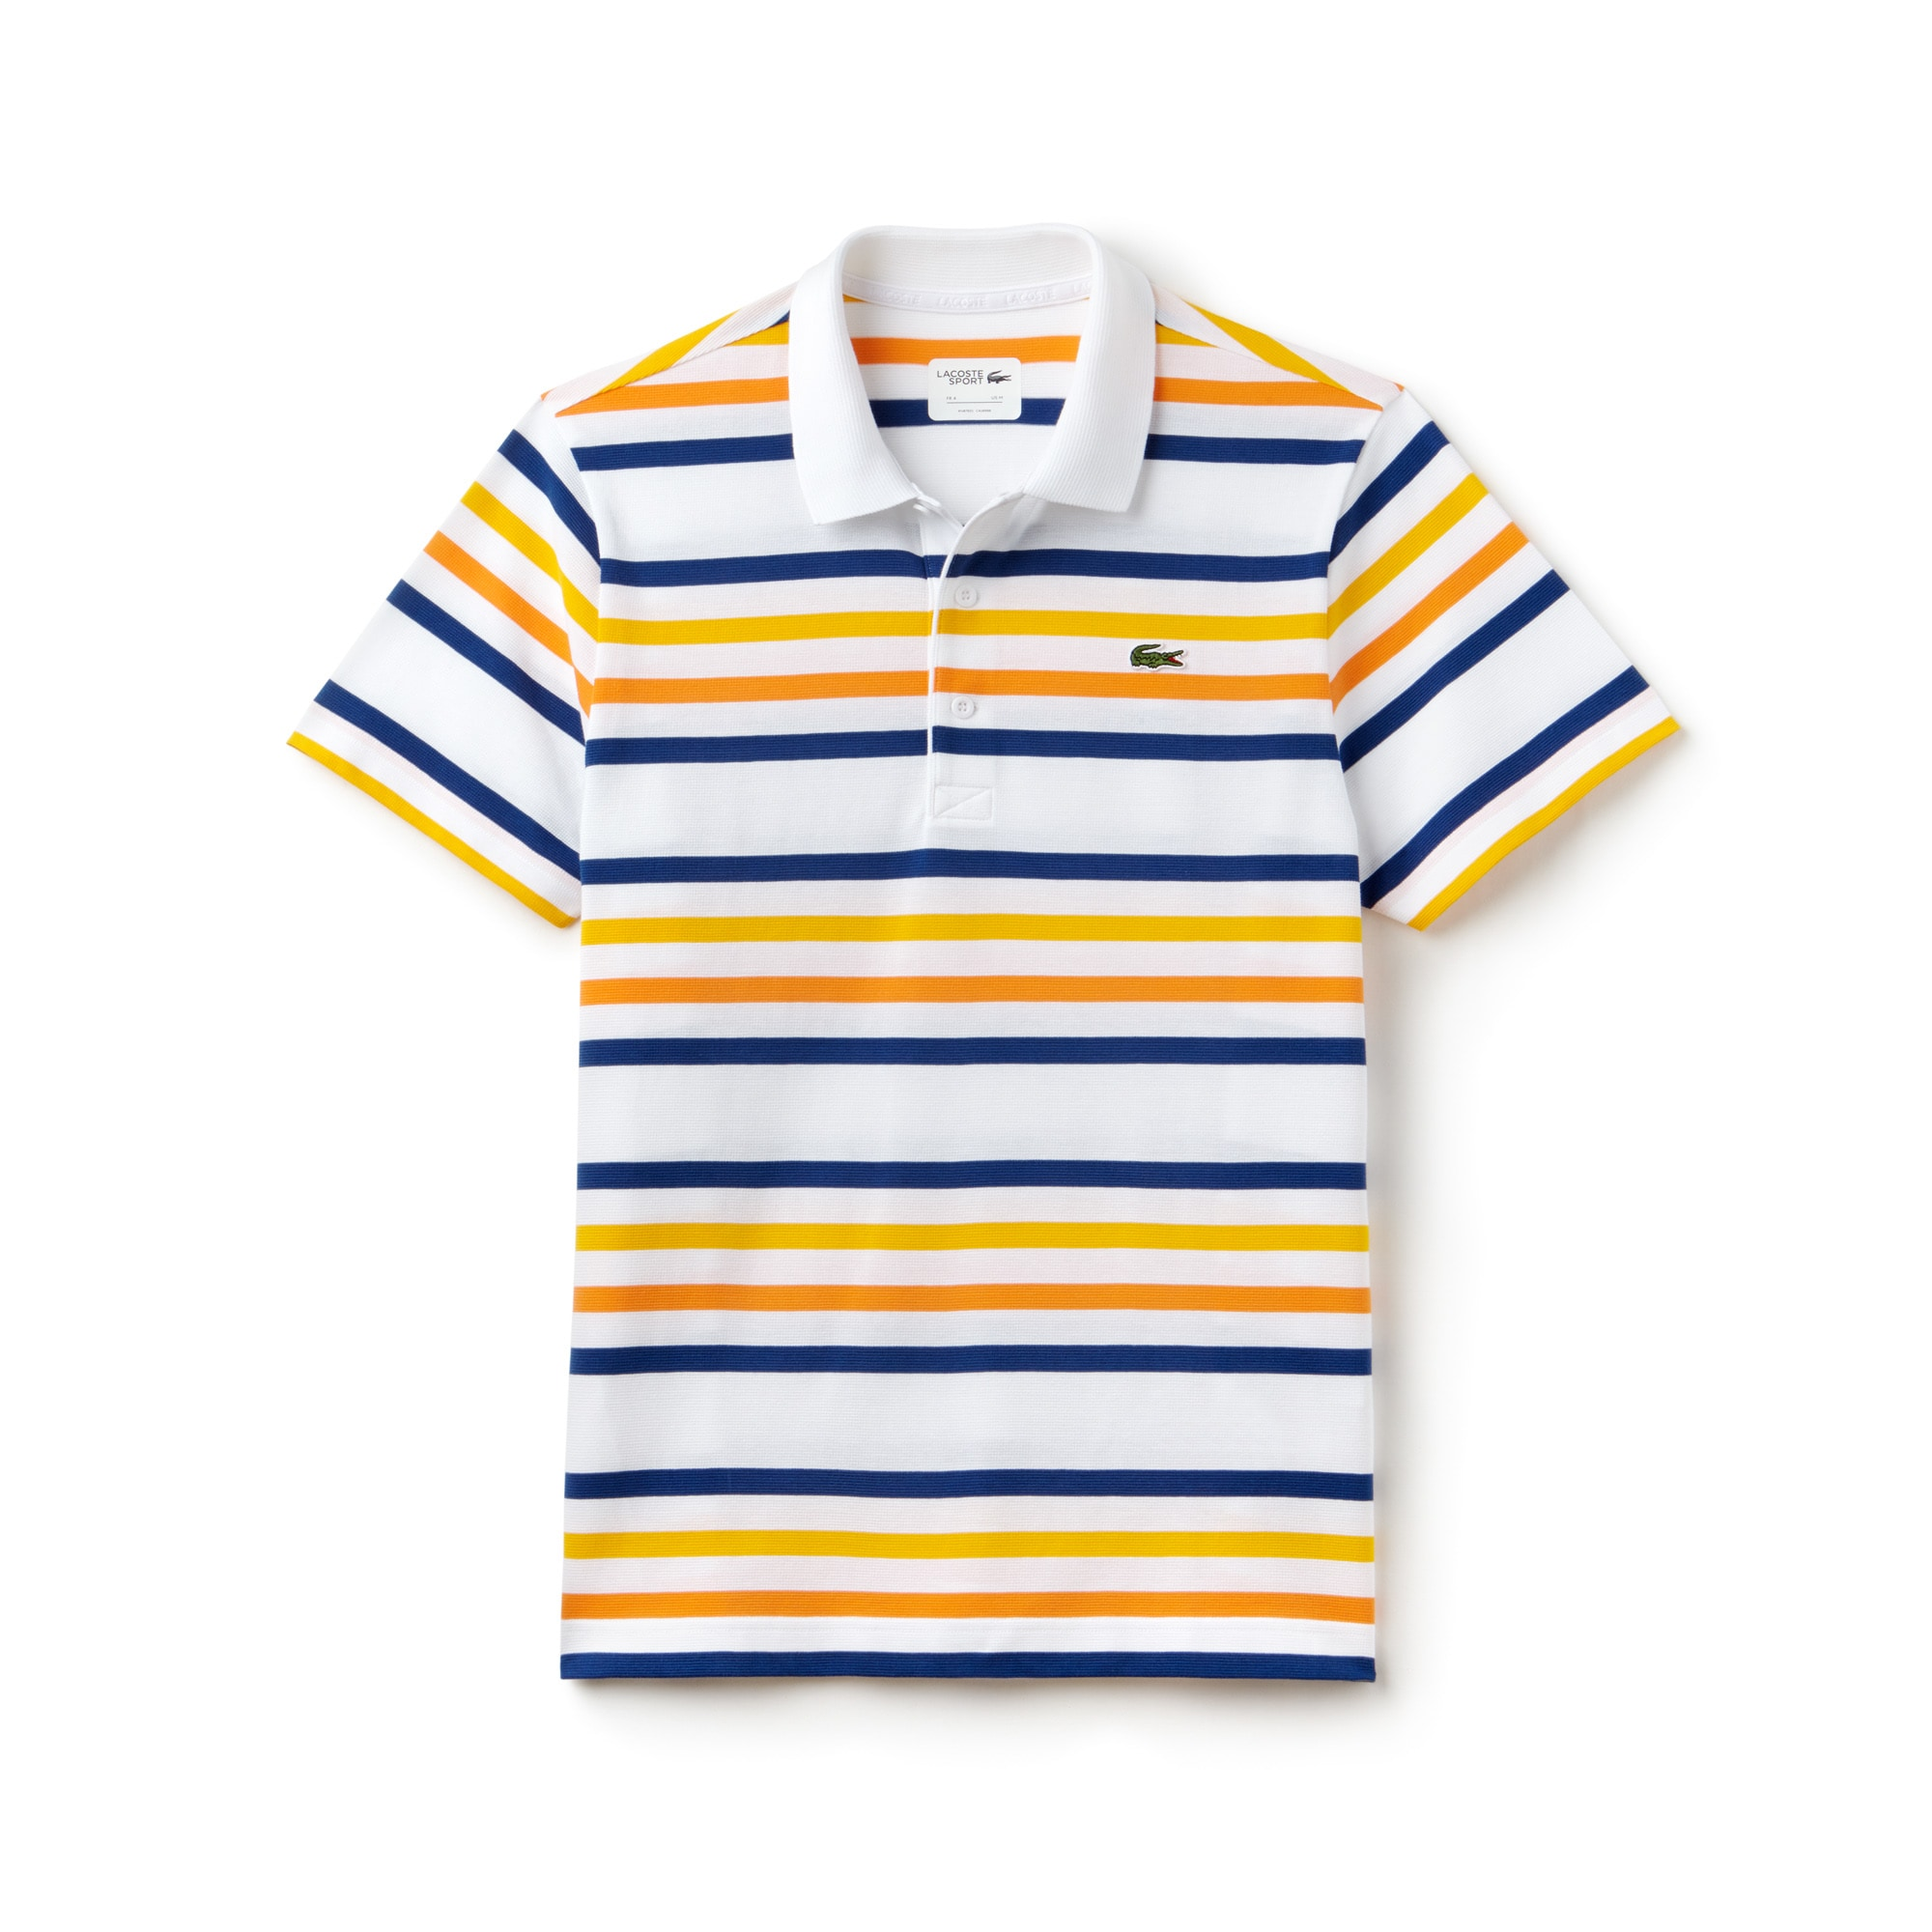 Men's Lacoste SPORT Striped Ultra-Light Cotton Tennis Polo Shirt